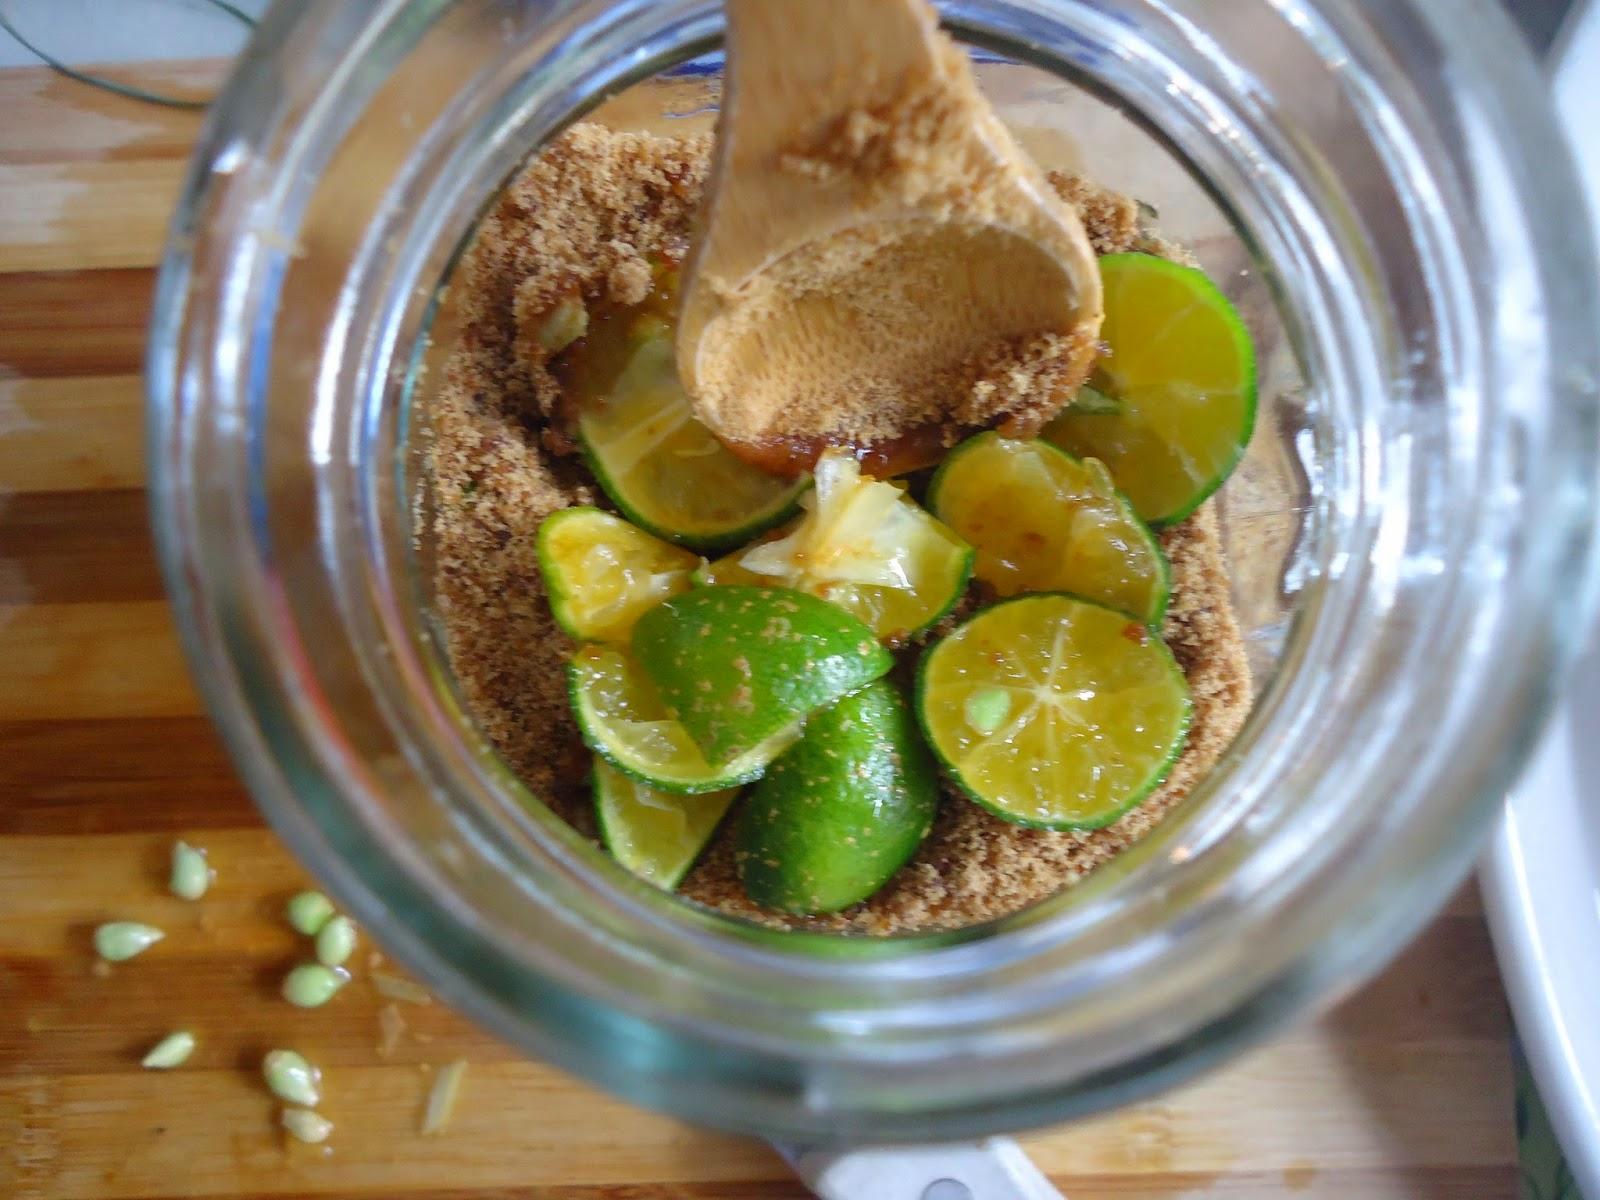 lacto-fermented herbal sweetener